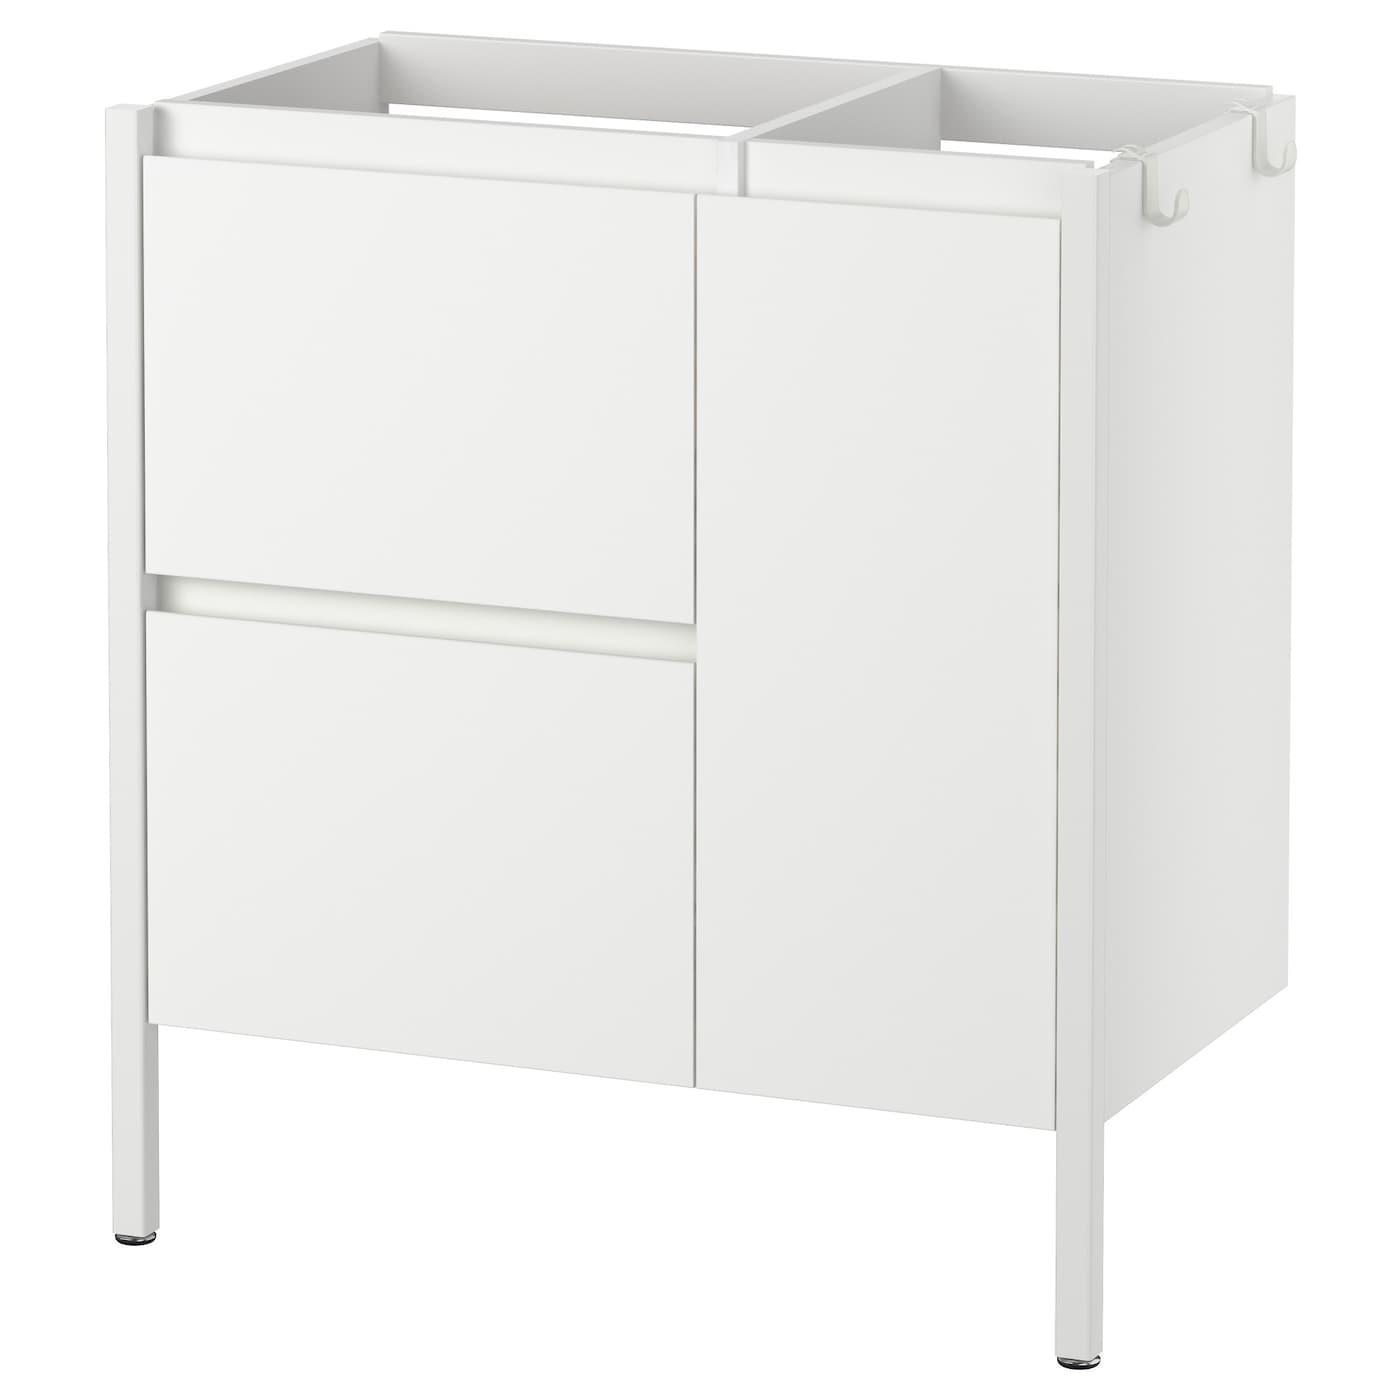 yddingen l ment lavabo blanc 70x76 cm ikea. Black Bedroom Furniture Sets. Home Design Ideas